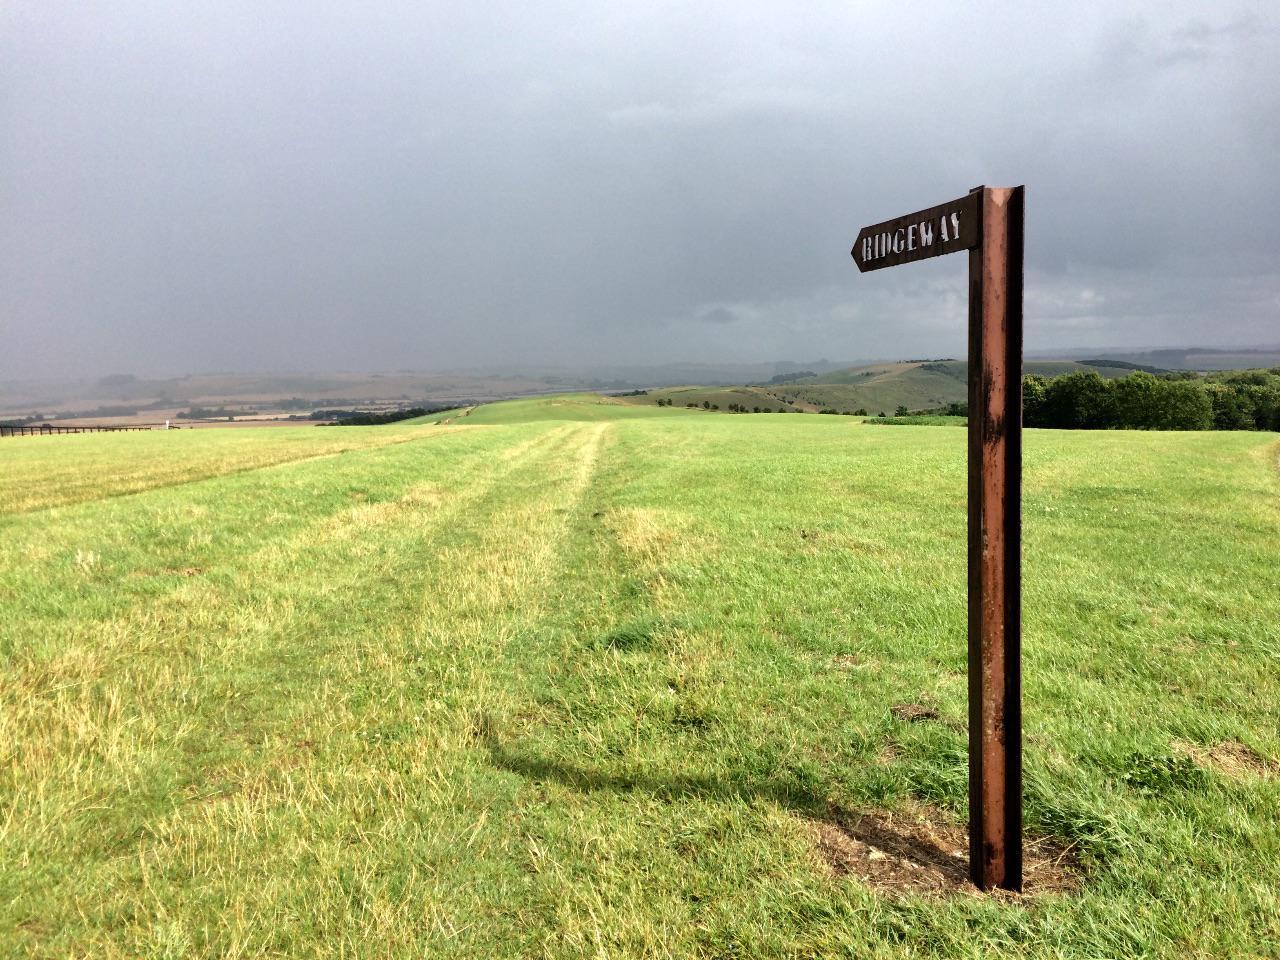 Signpost points along the Ridgeway National Trail